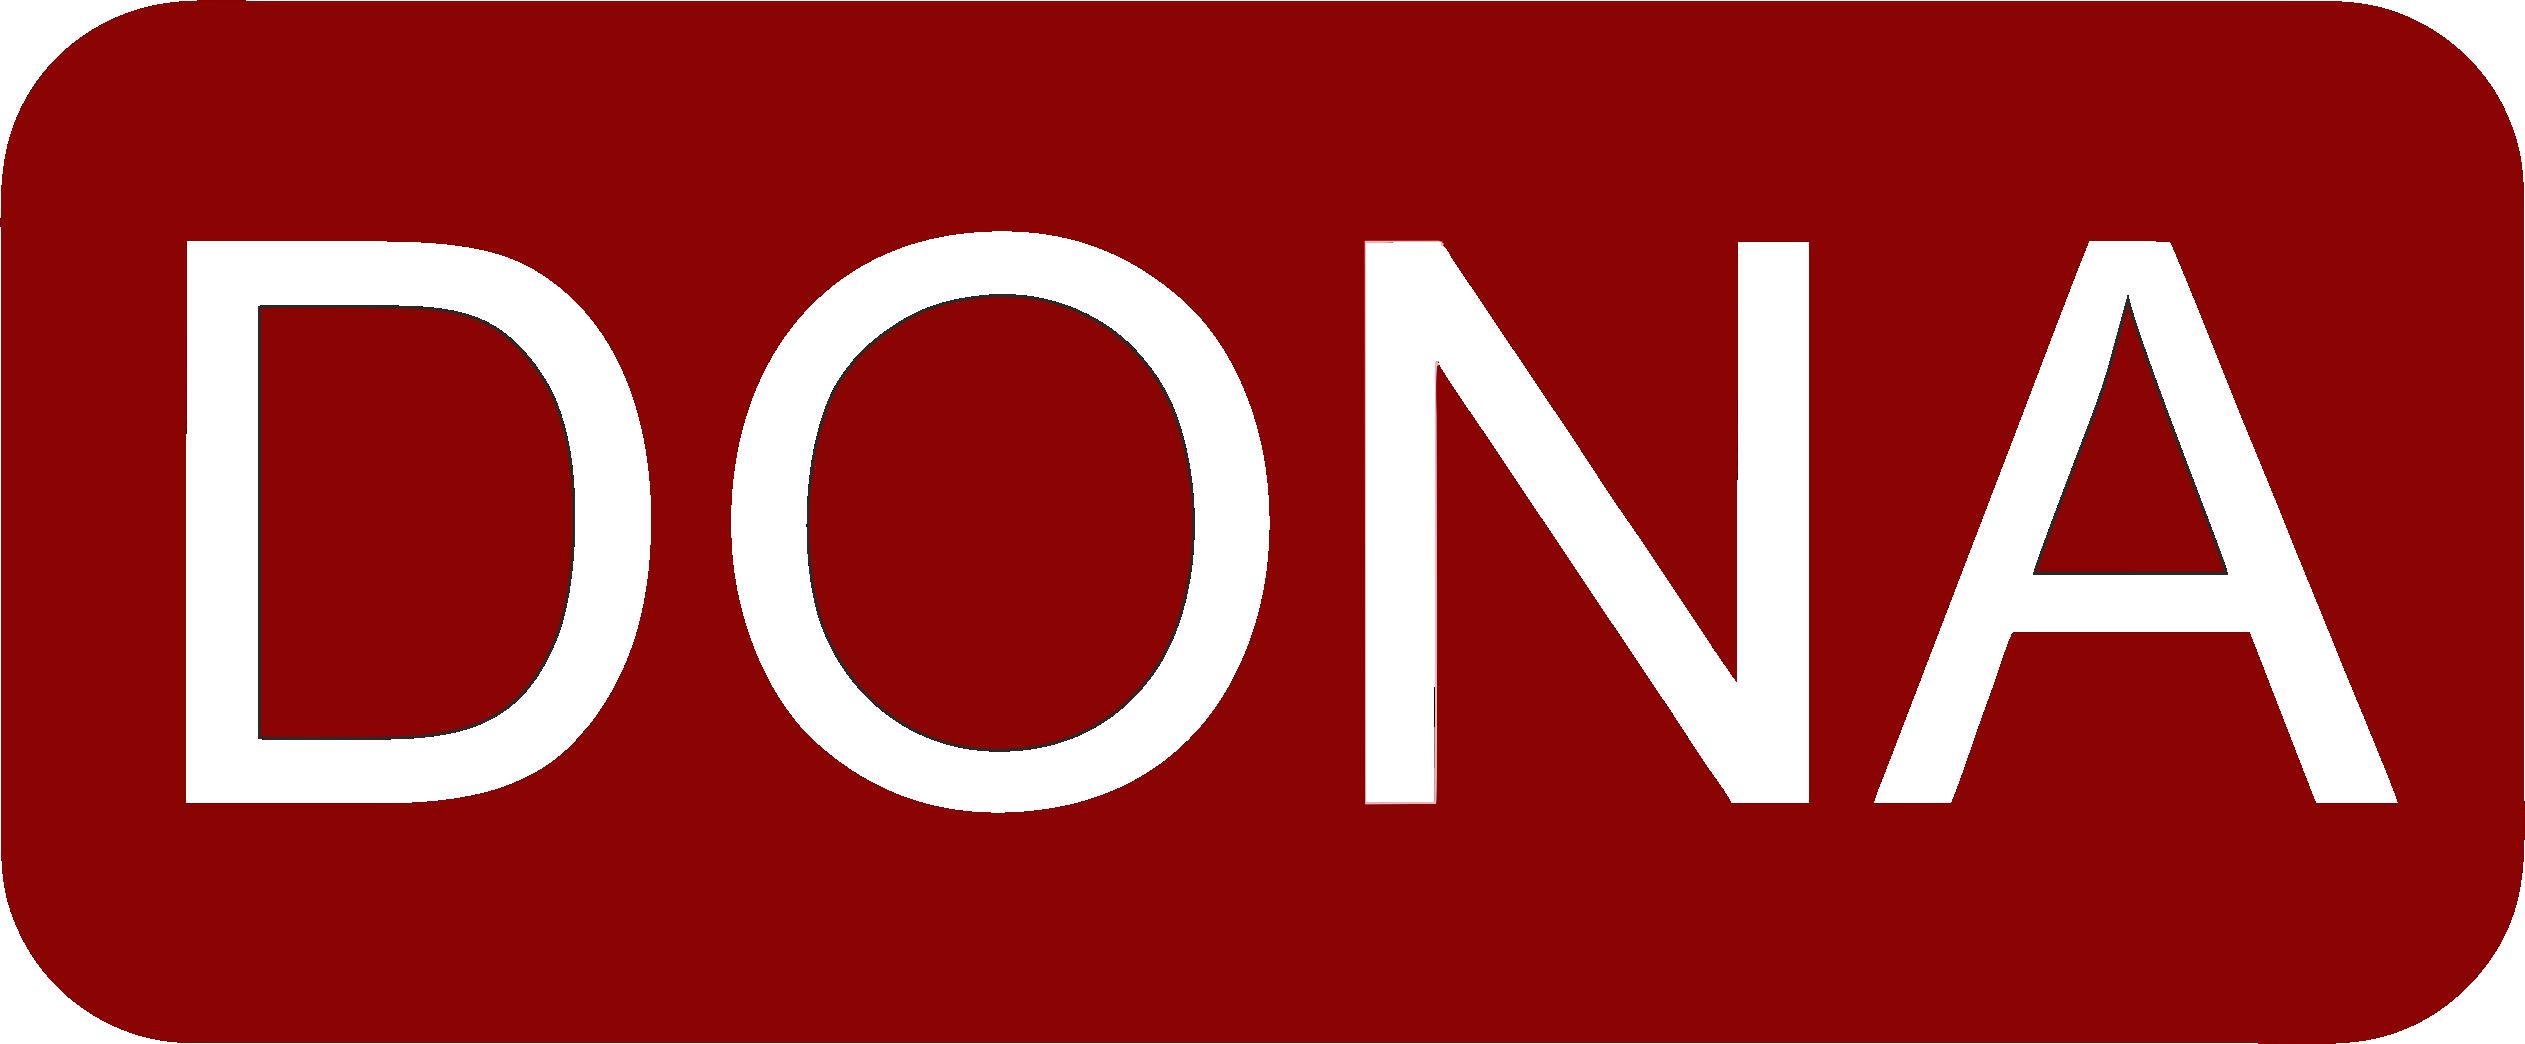 santabbondioweb4-1.jpg